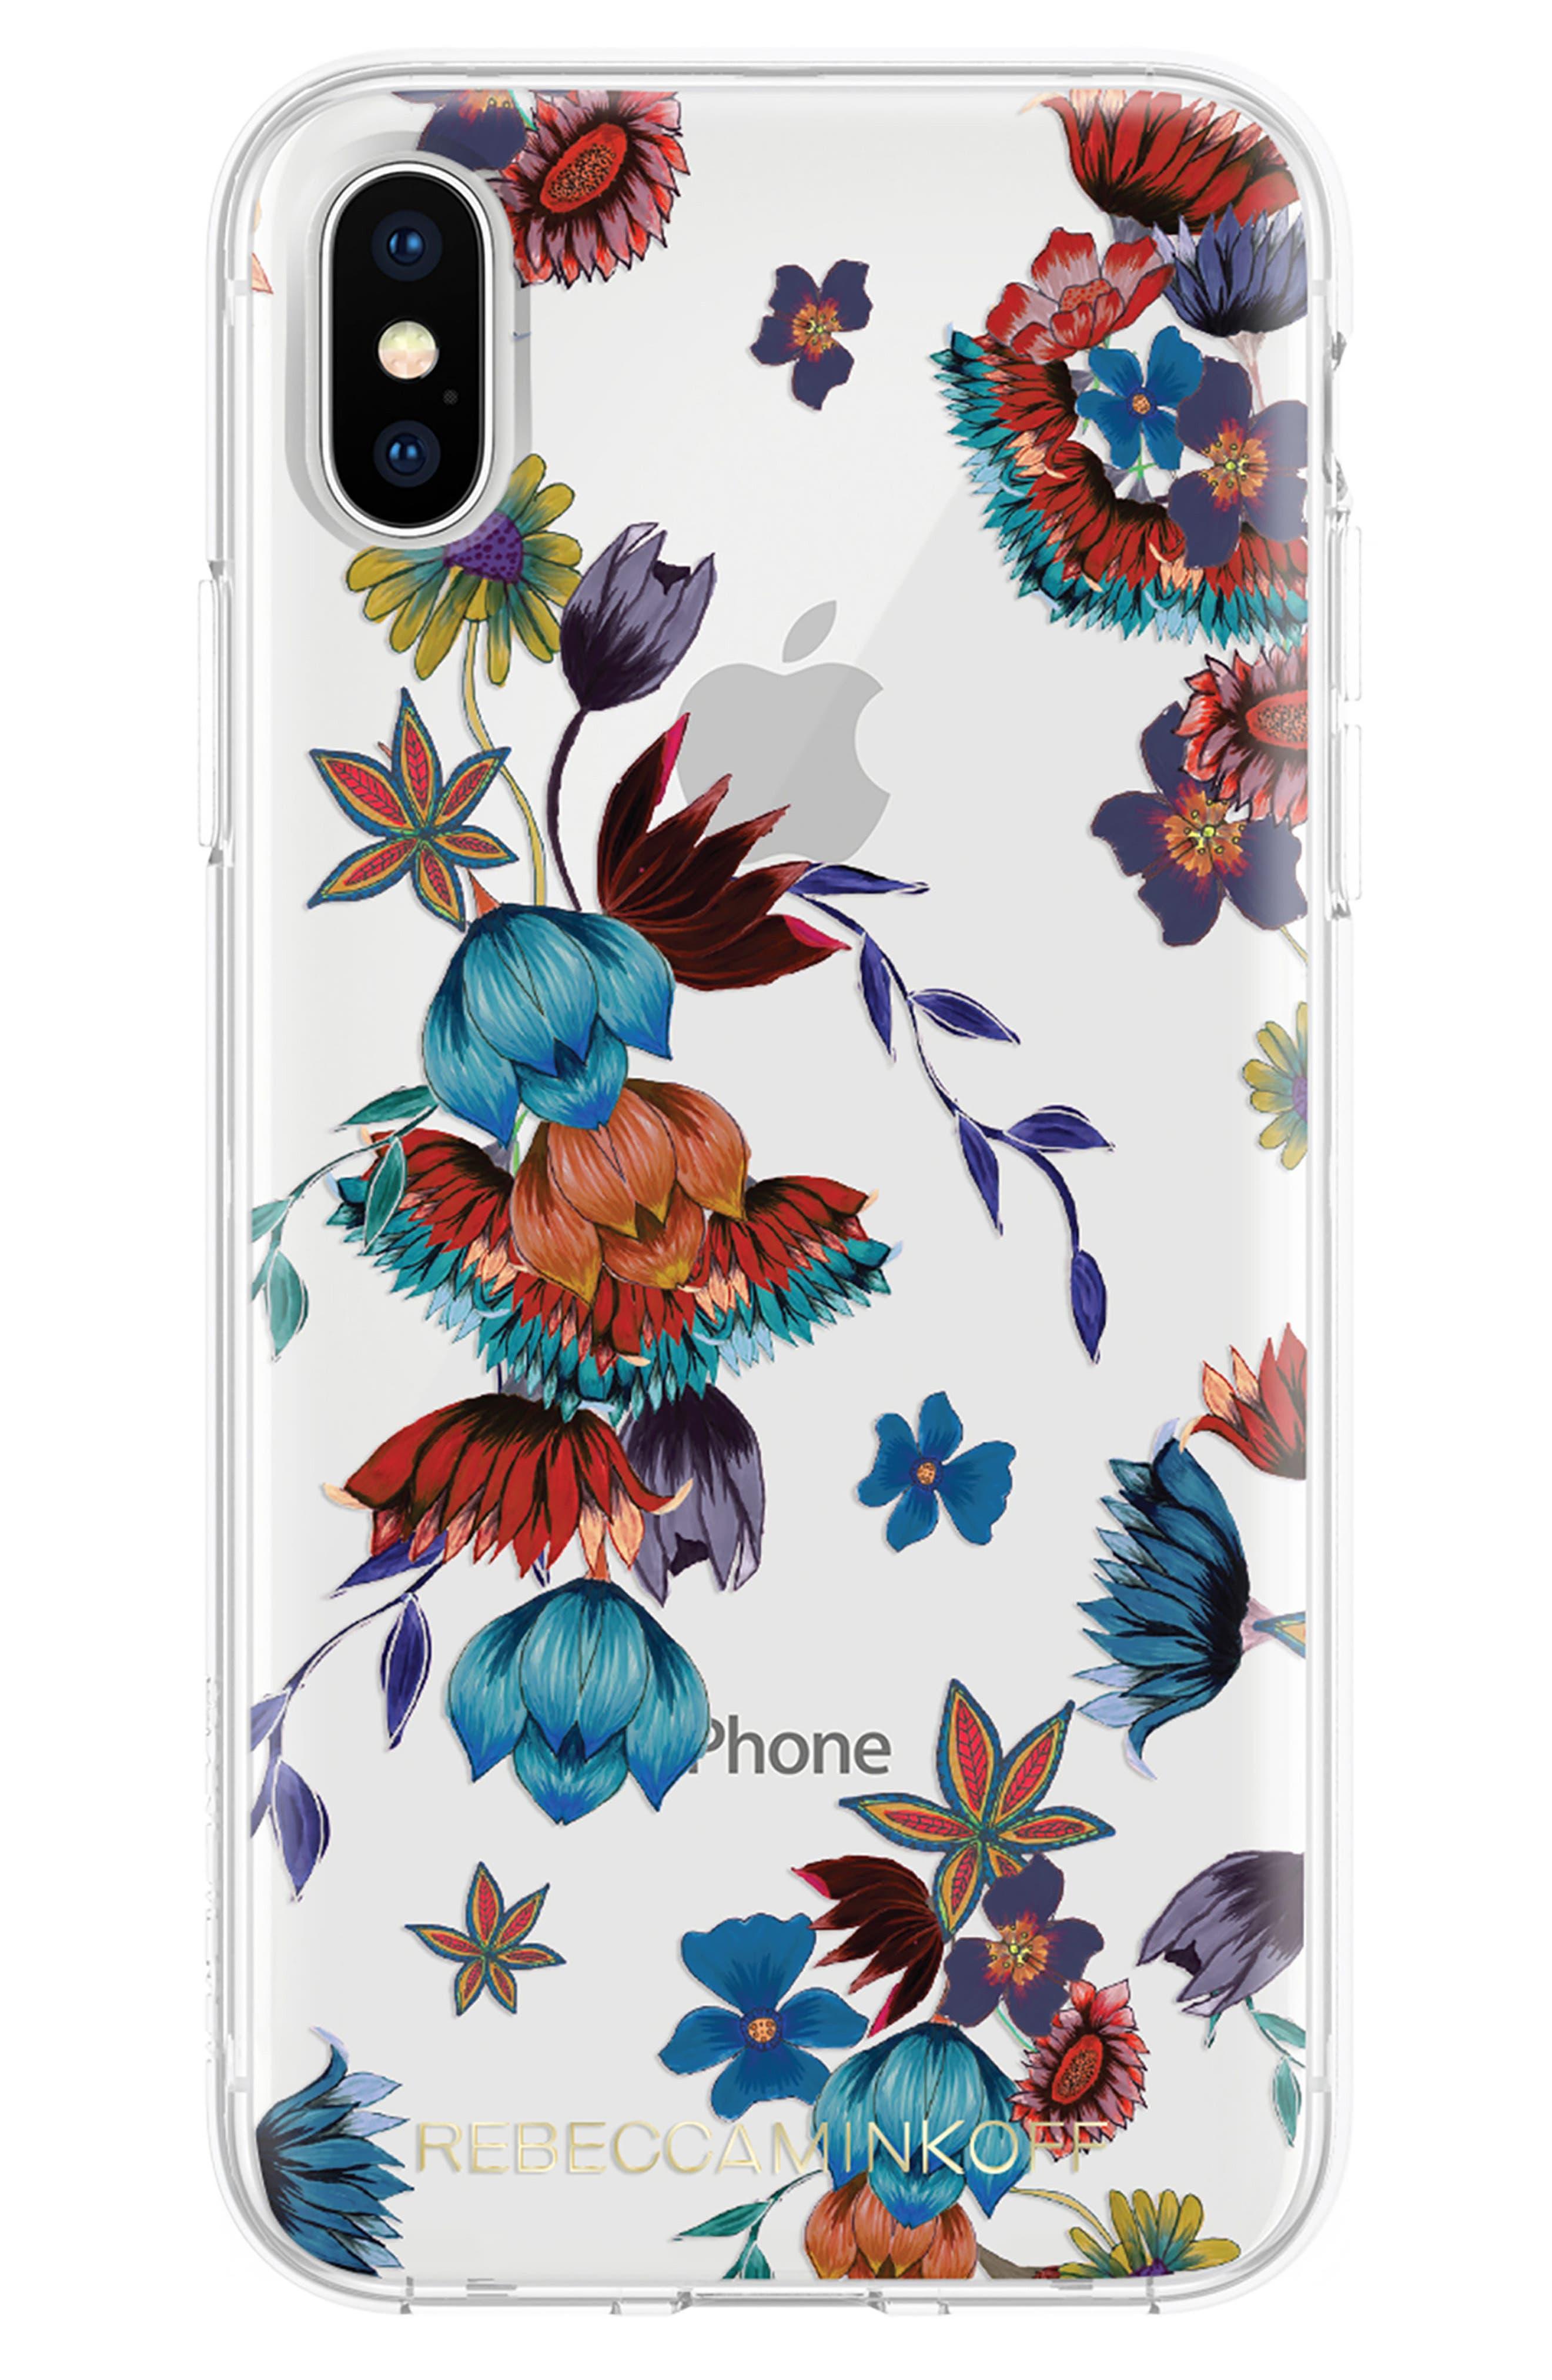 REBECCA MINKOFF Punk Floral iPhone X/Xs Case, Main, color, 400